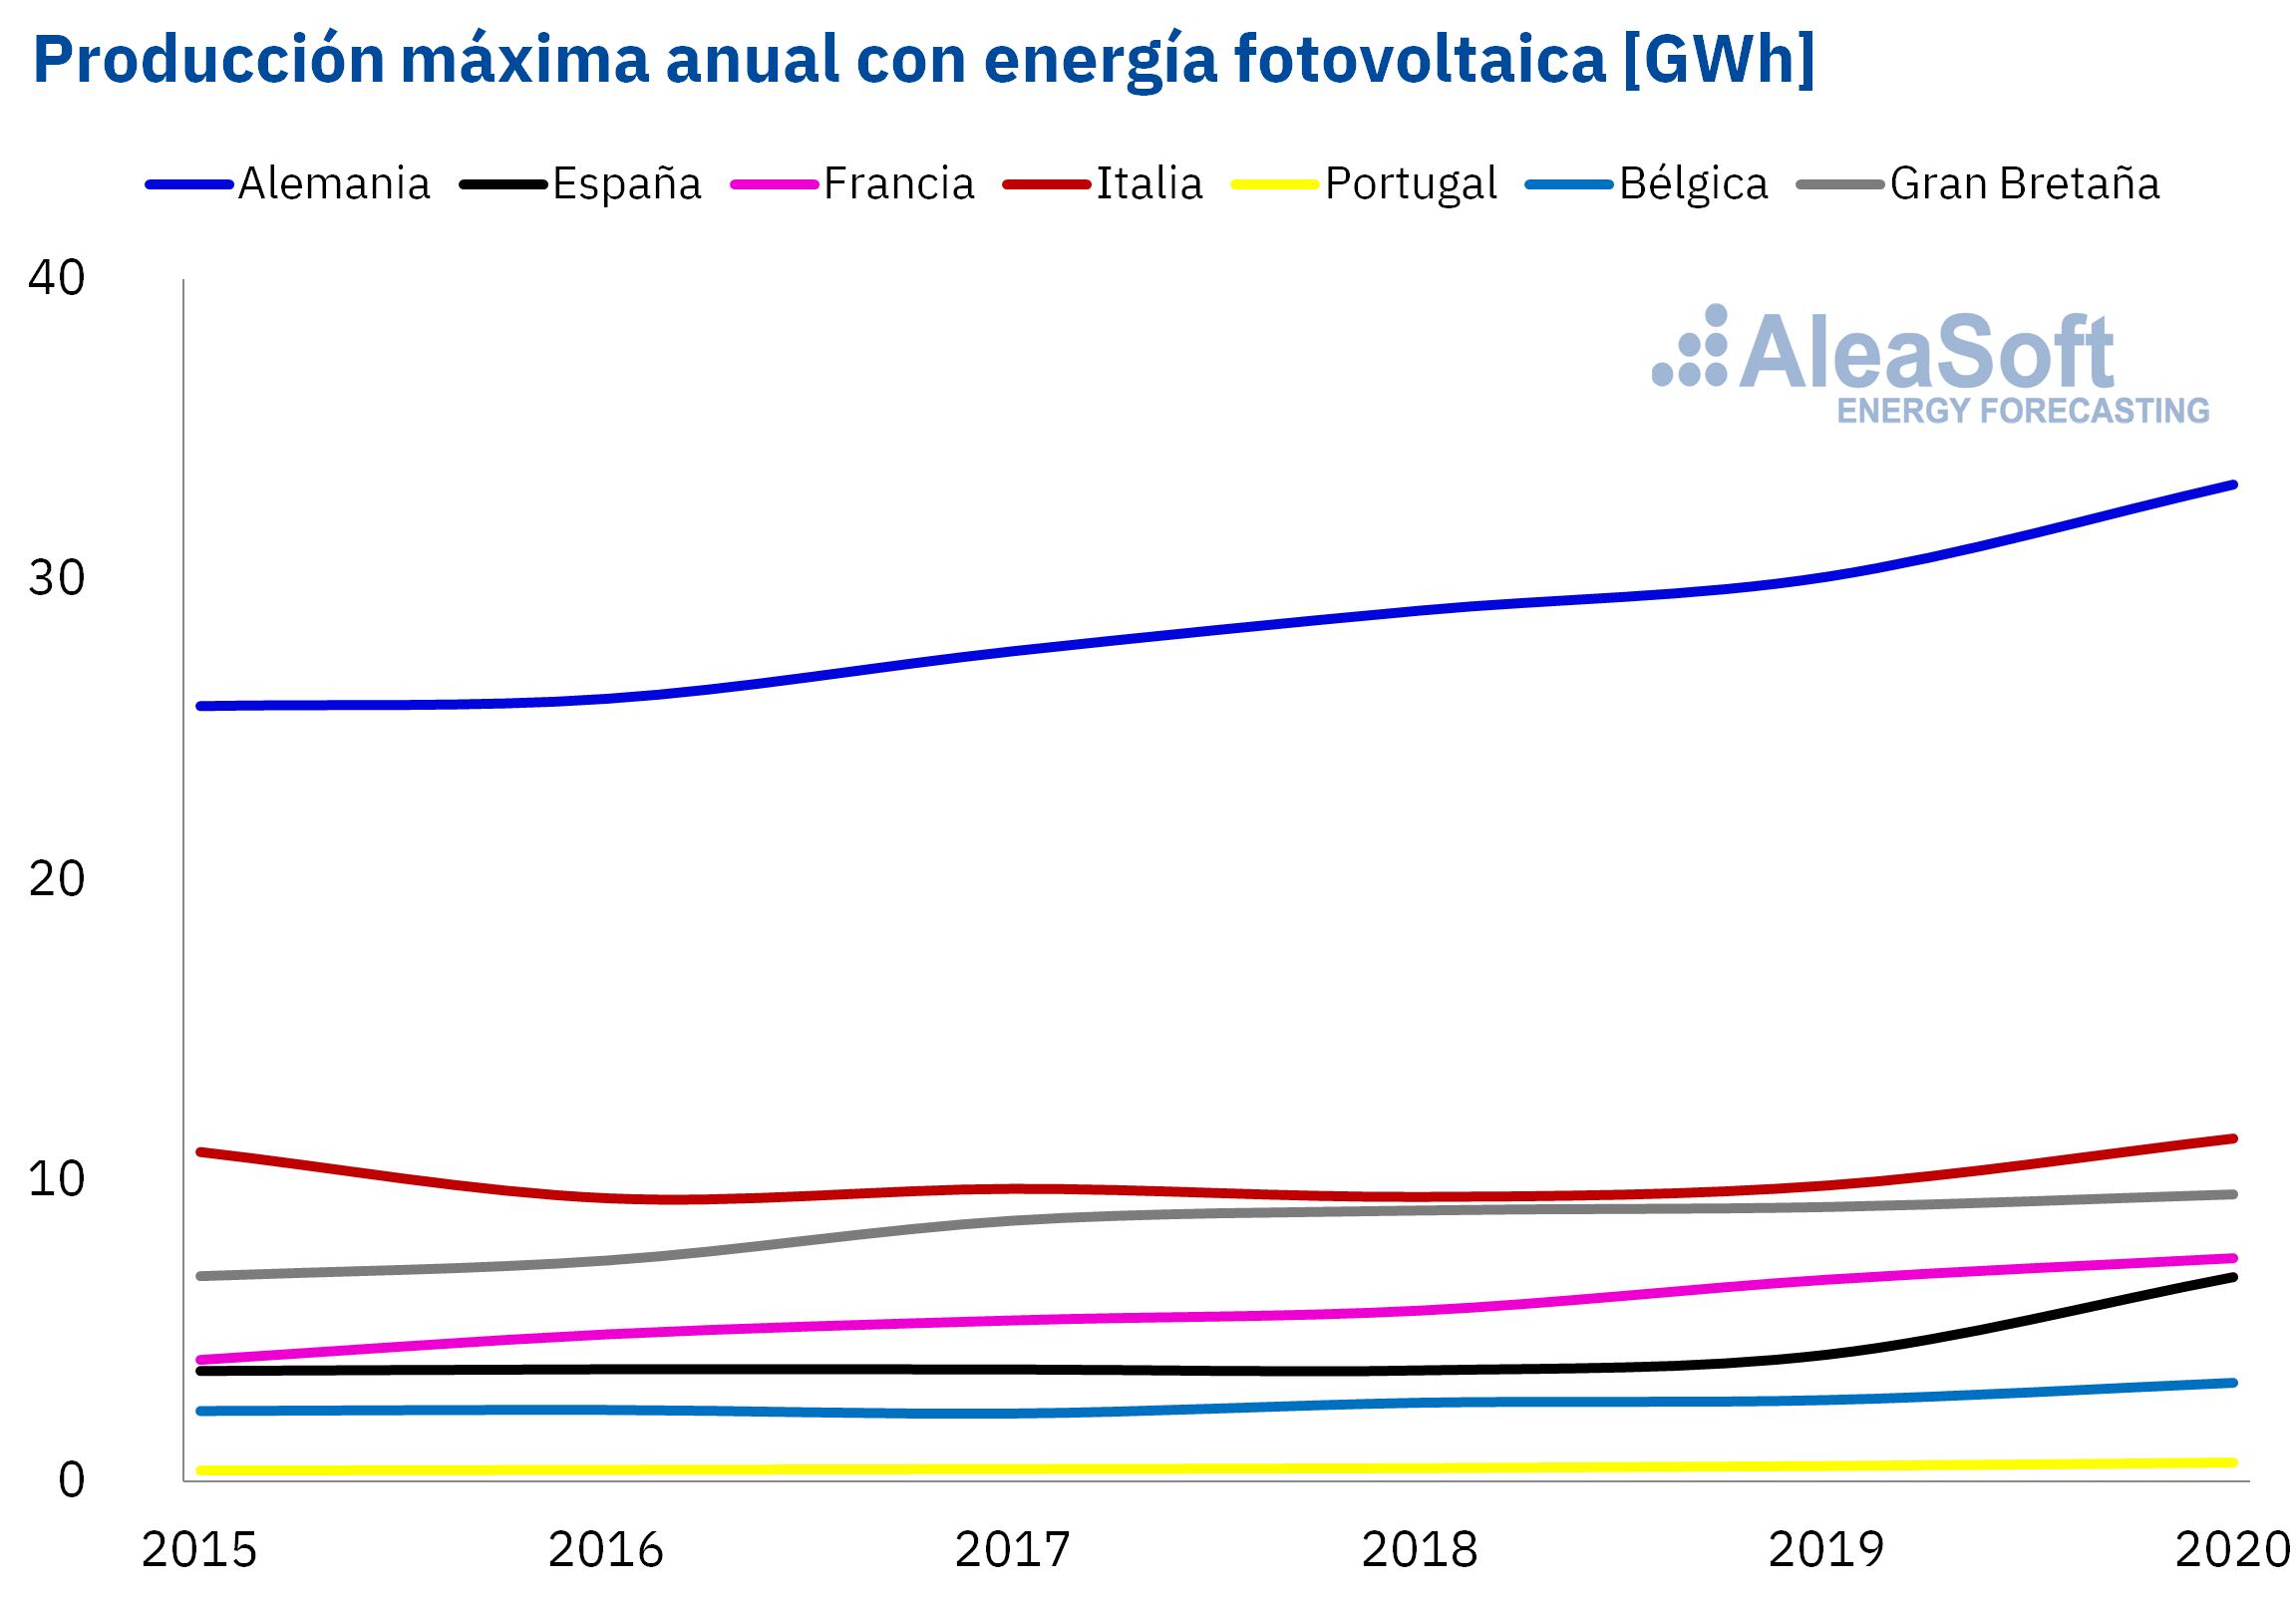 AleaSoft - producción horaria máxima anual de energía fotovoltaica